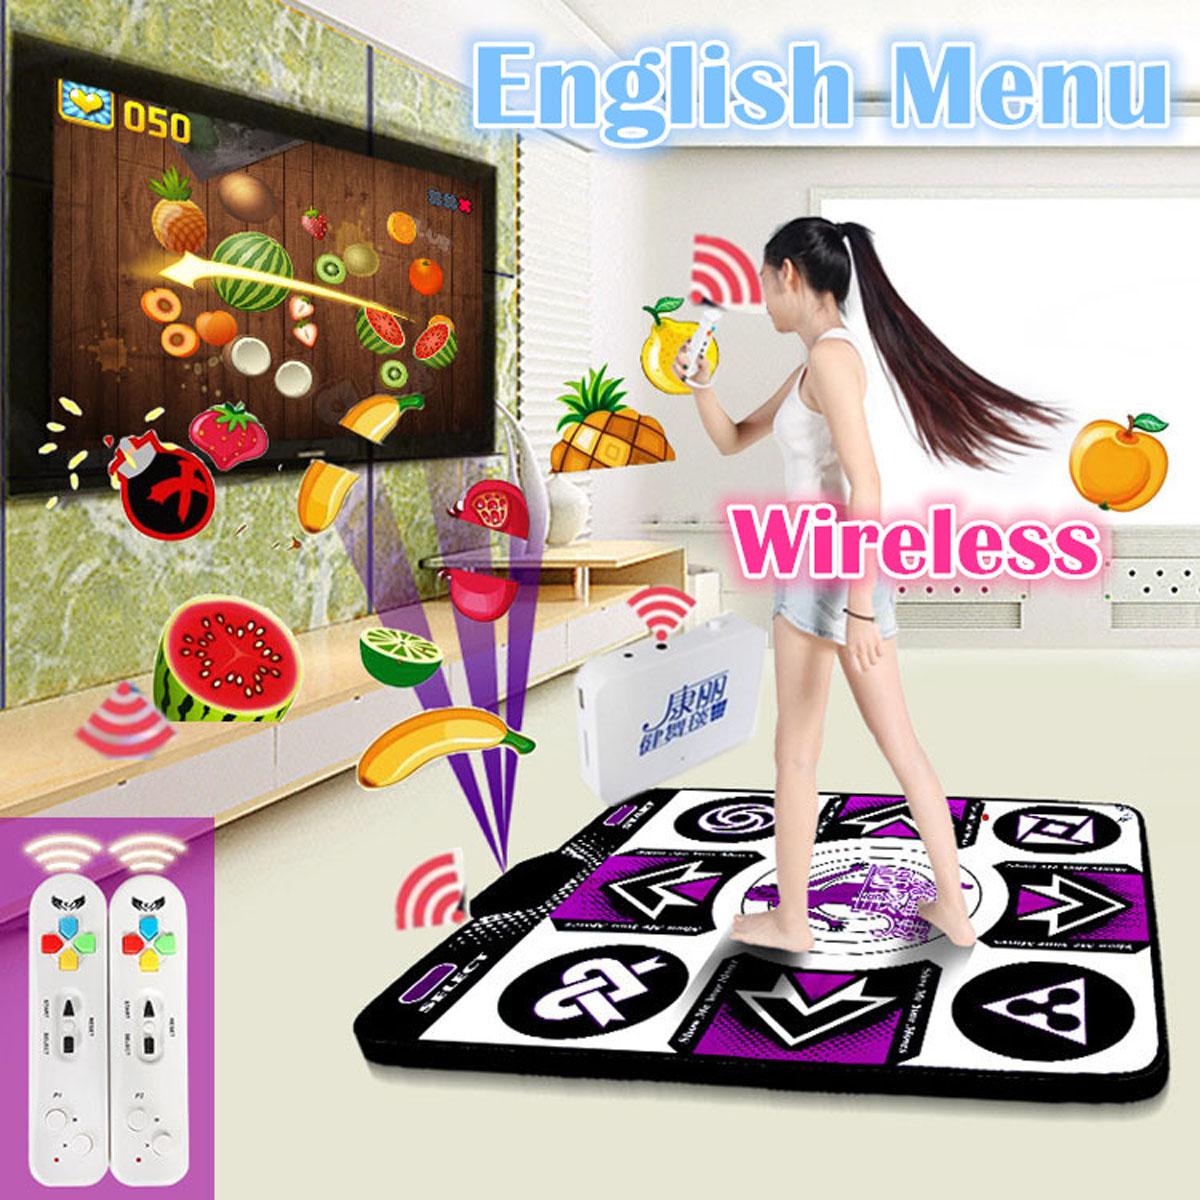 Original KL English menu 11 mm thickness single dance pad Non-Slip Pad yoga mat   2 remote controller sense game for PC  amp  TV